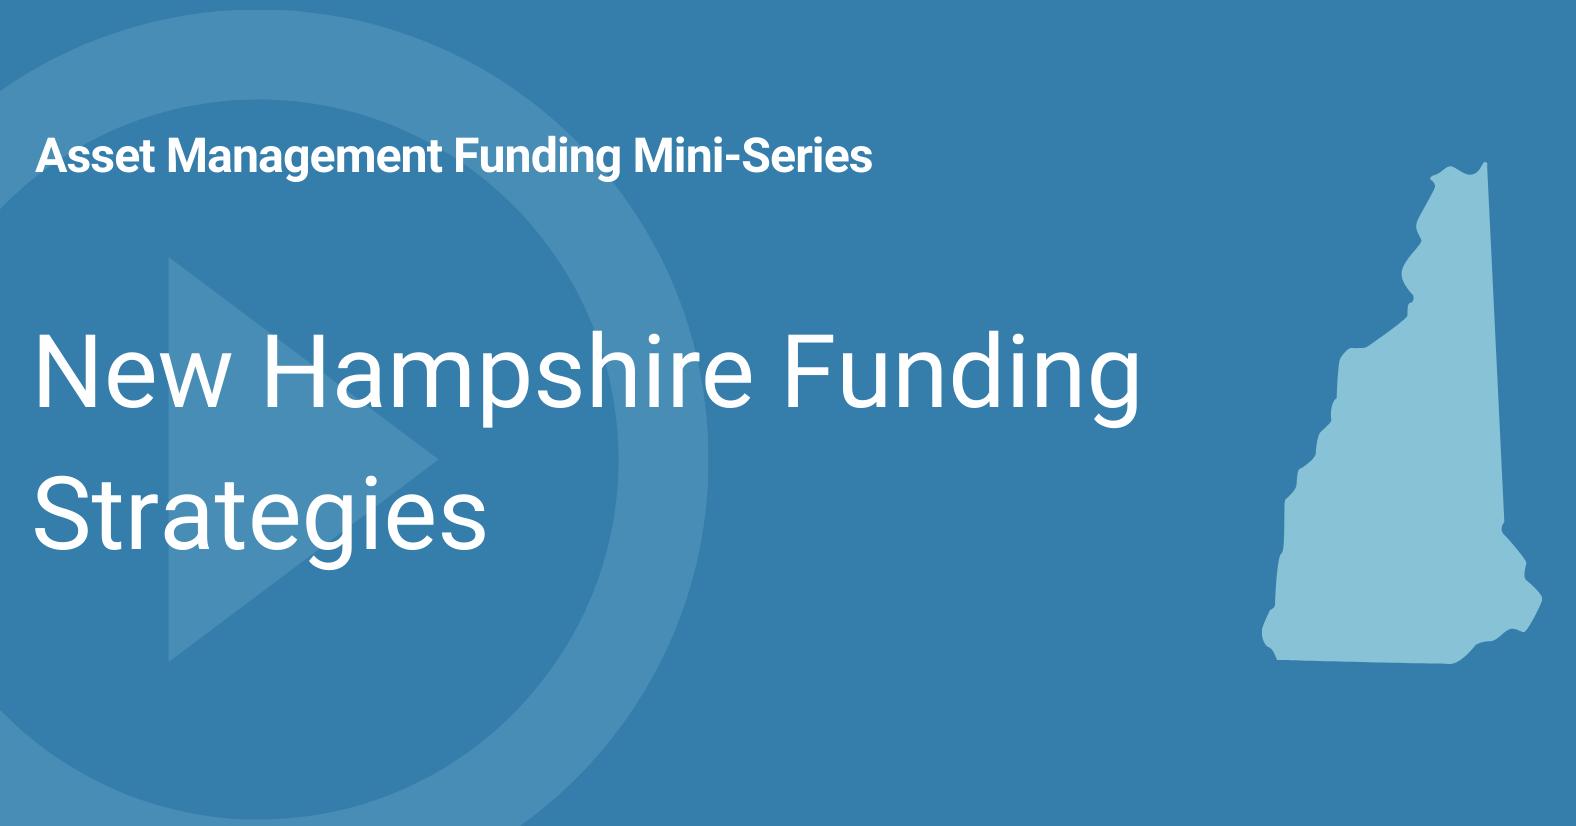 Asset Management Funding Mini-Series New Hampshire Funding Strategies